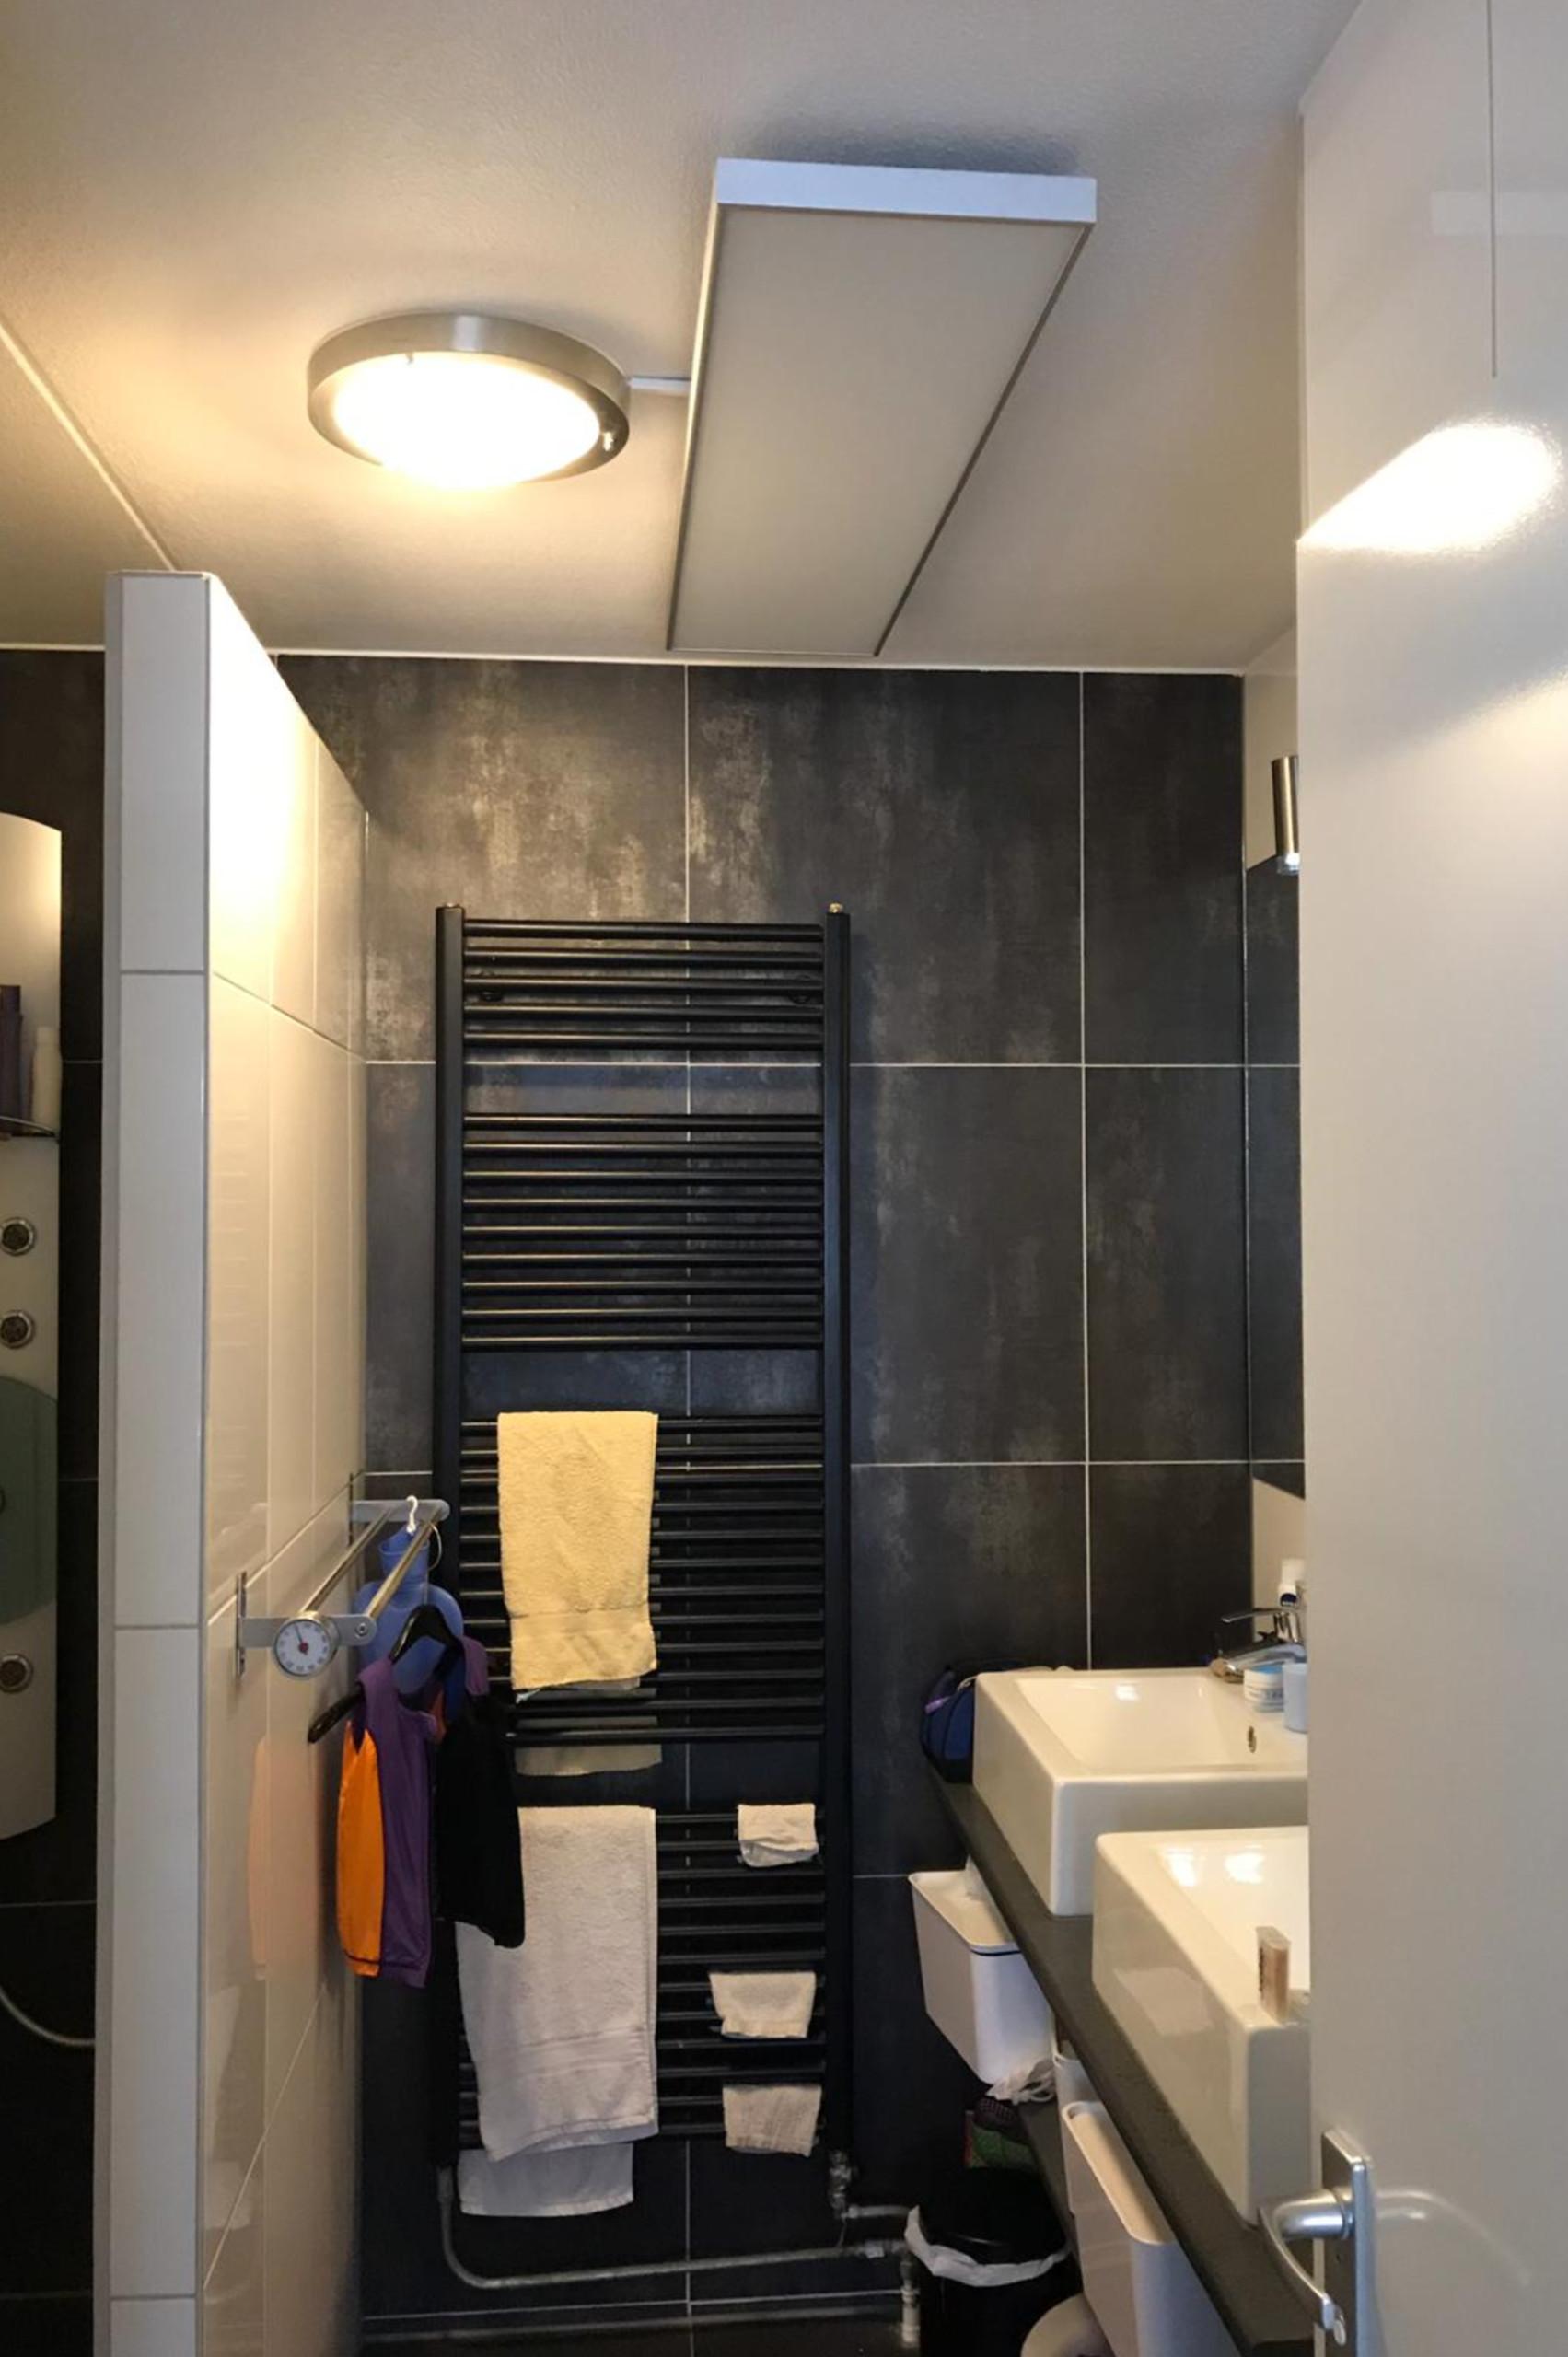 infrarood-verwarming-badkamer